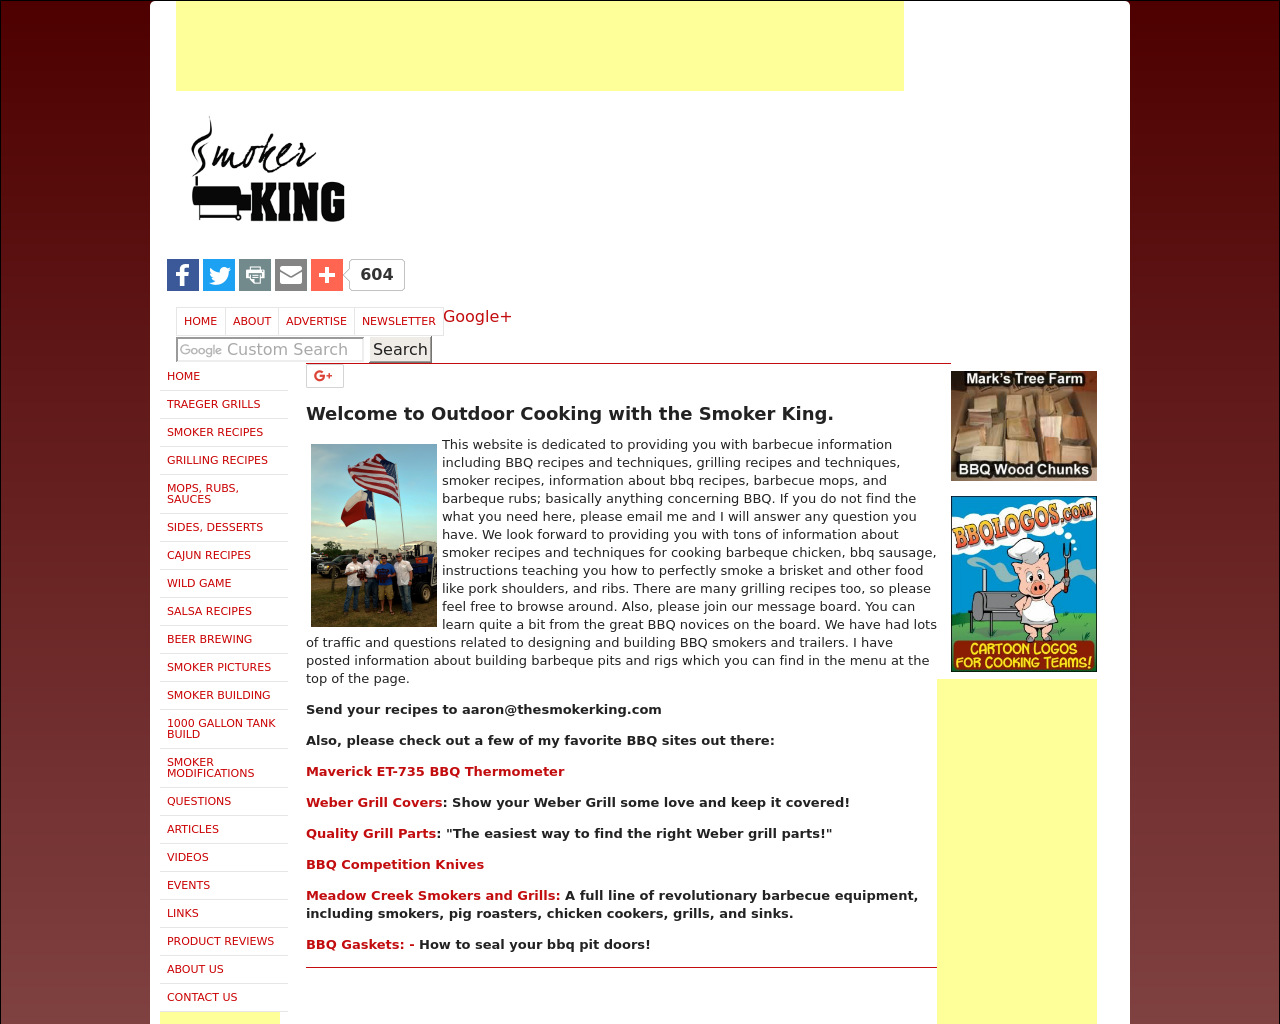 The-Smoker-King-Advertising-Reviews-Pricing